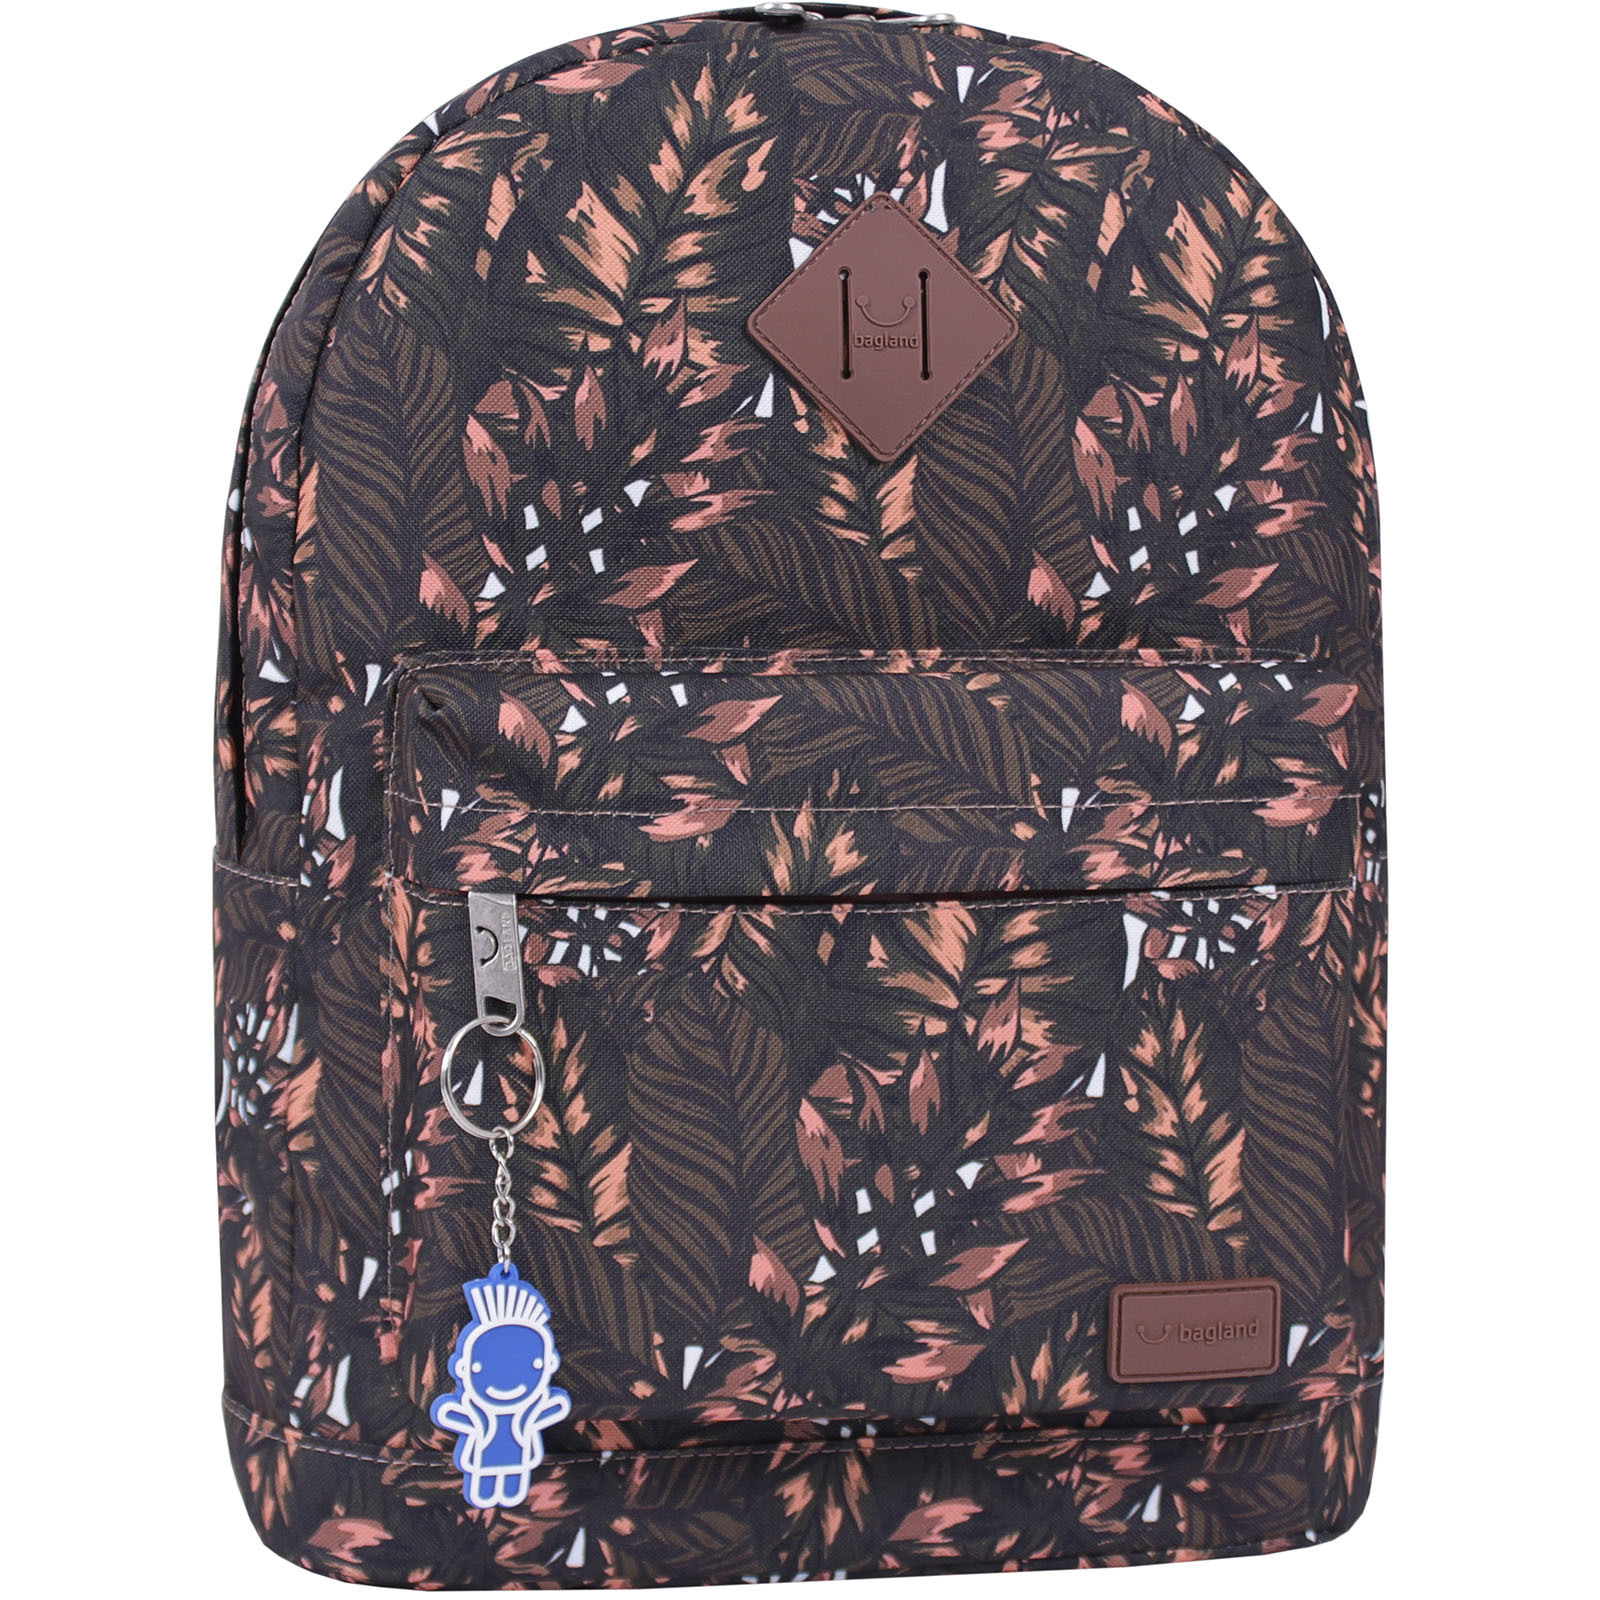 Городские рюкзаки Рюкзак Bagland Молодежный 17 л. сублимация 475 (00533664) IMG_9441_суб.475_.JPG